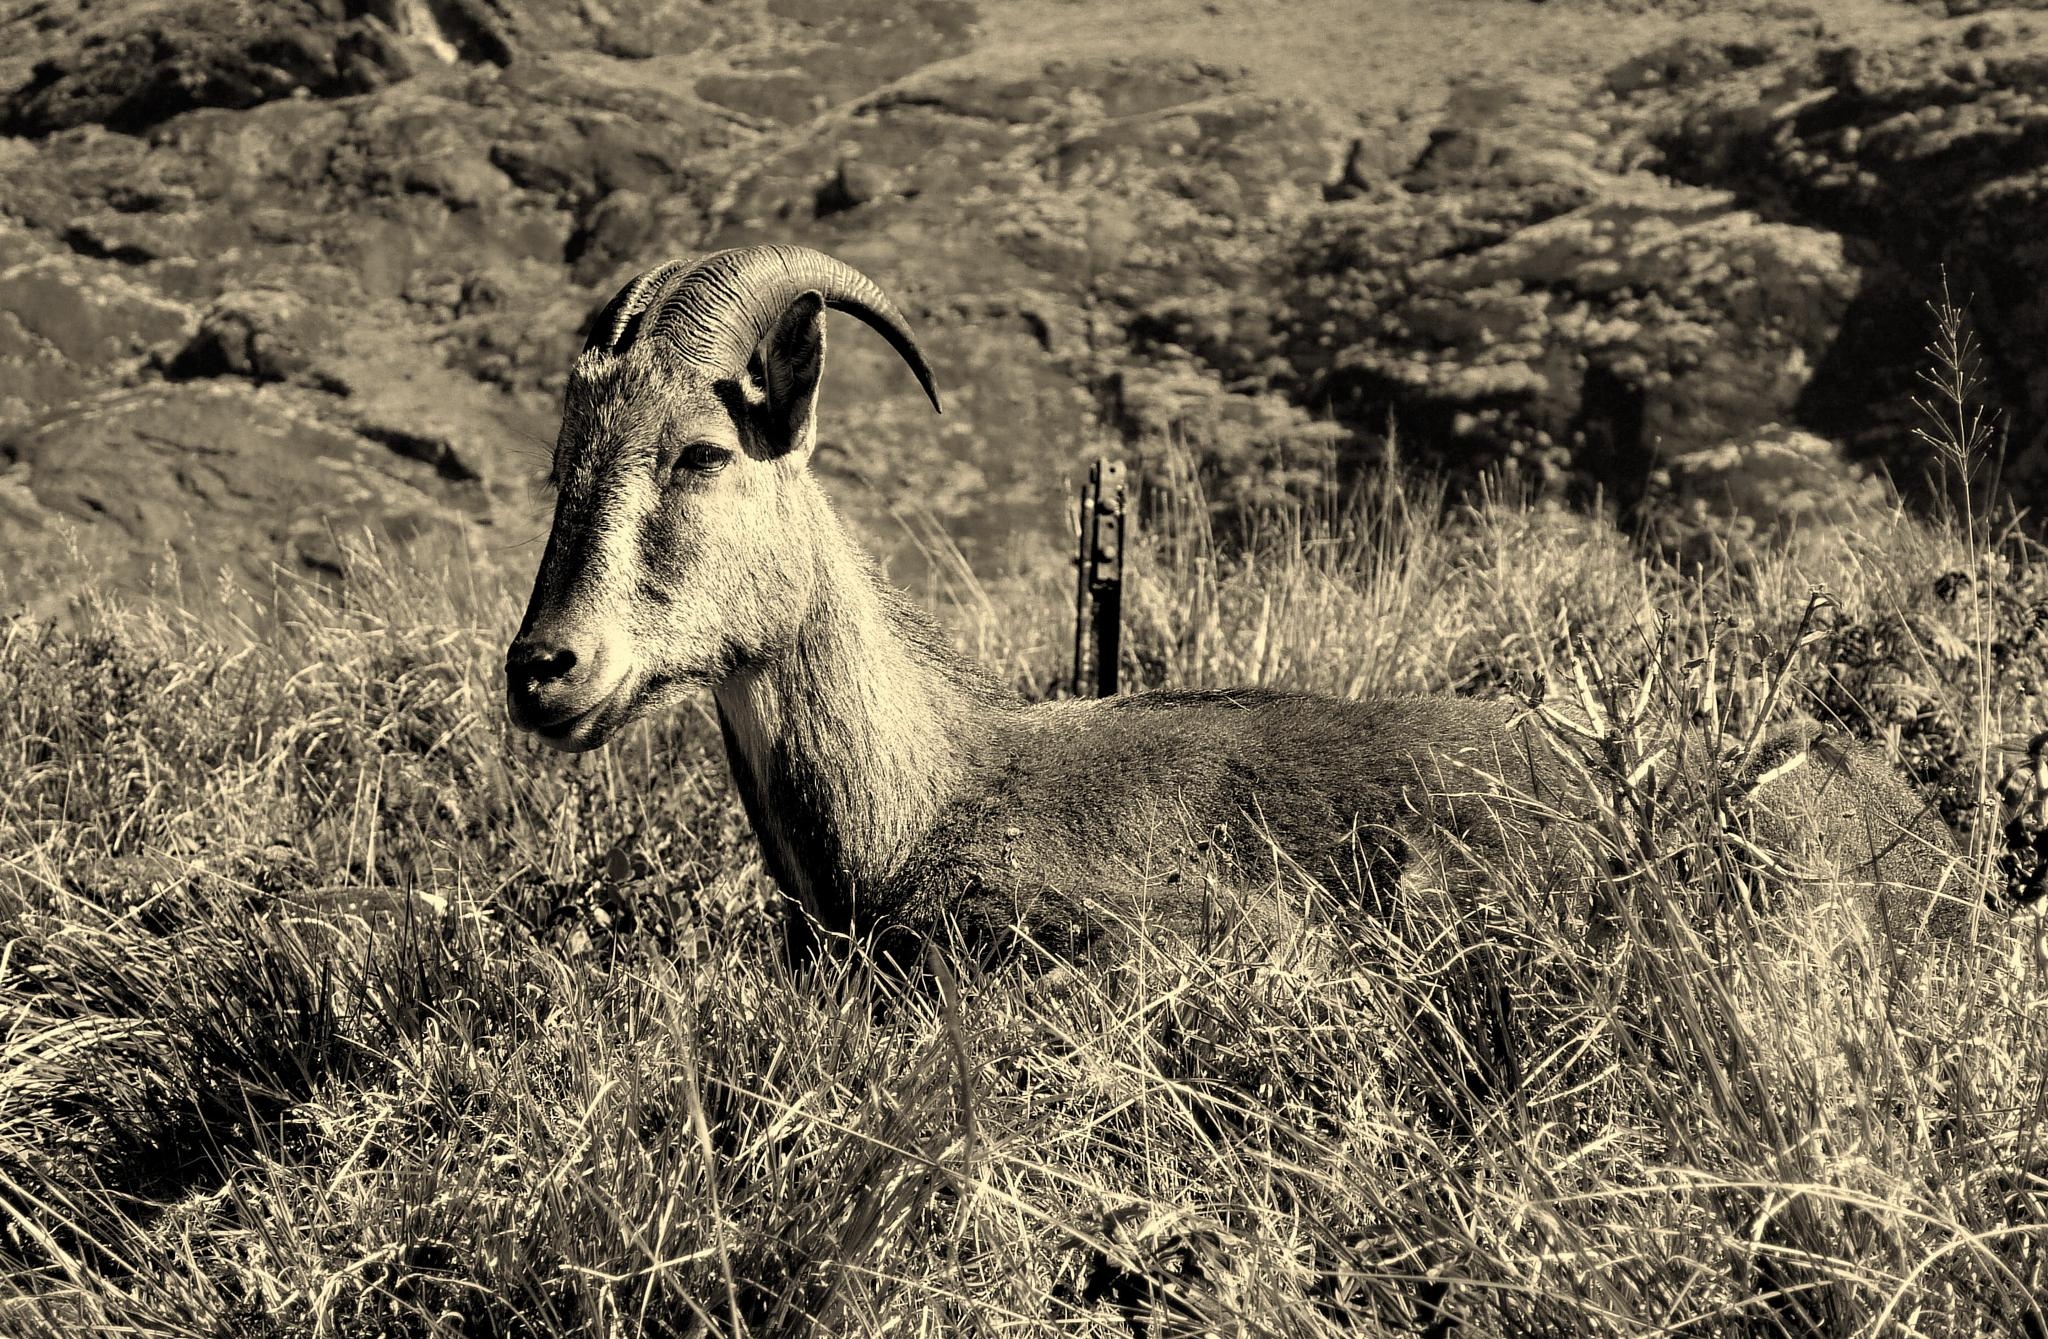 Nil Giri Thar, kerala, india by samirsarkar